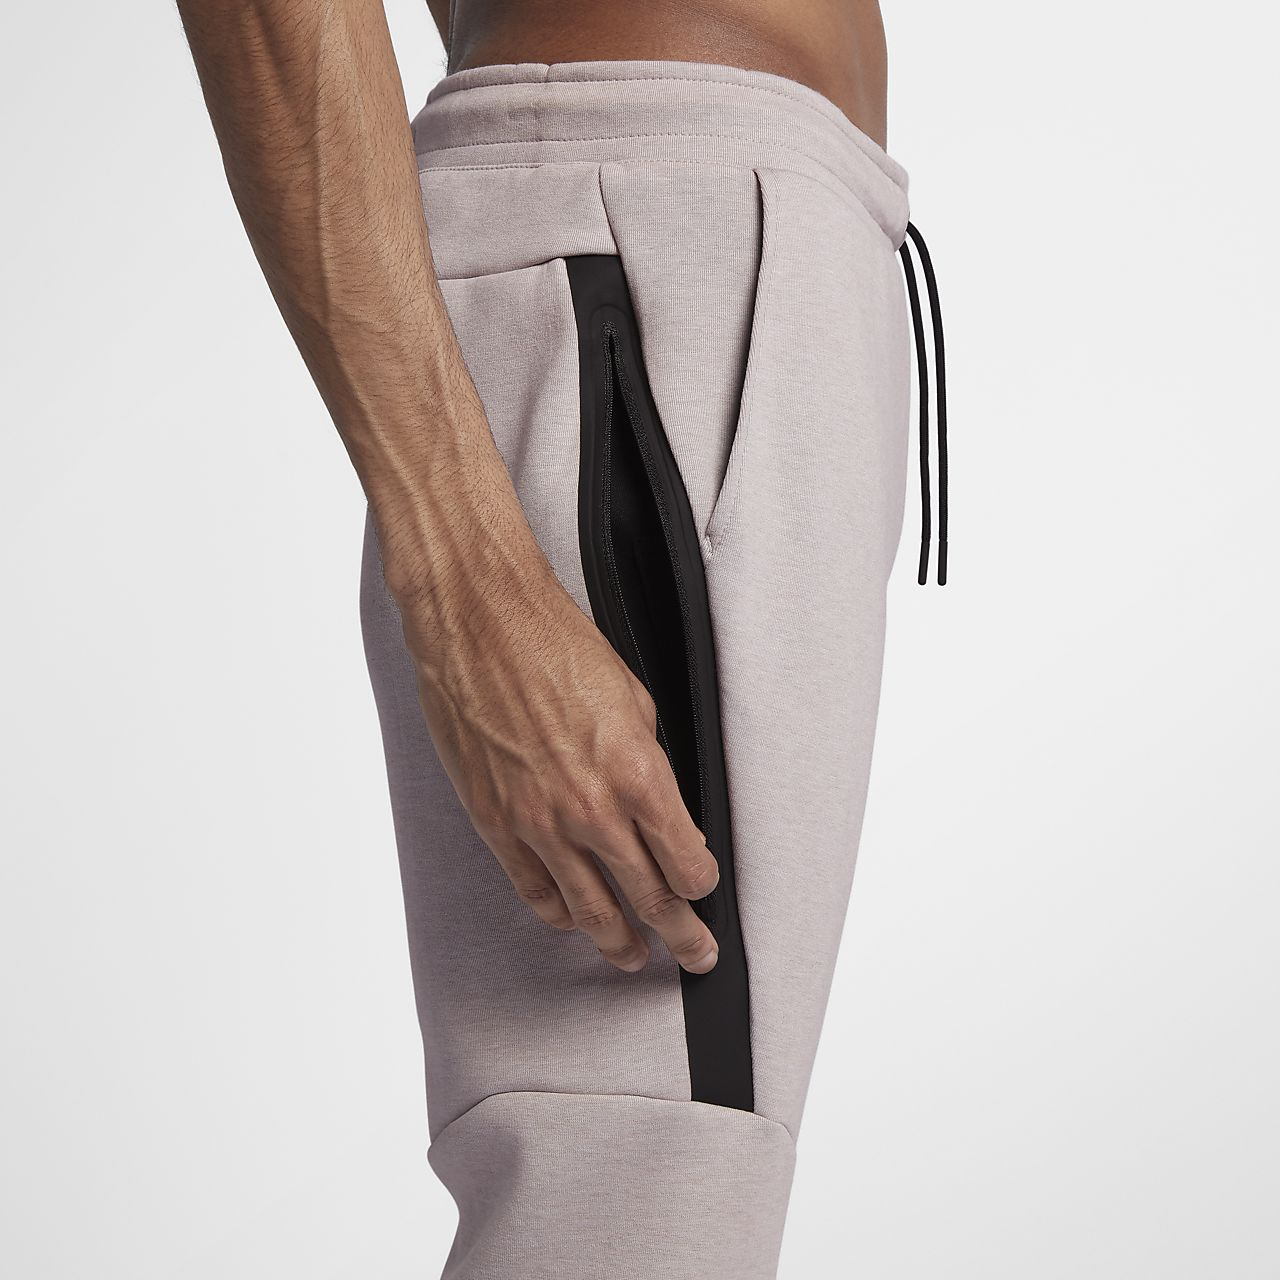 6492546811cf Converse Chuck Fleece Three-Quarter Pants Sportswear for Women Shop Womens  Sportswear COLOUR-grey